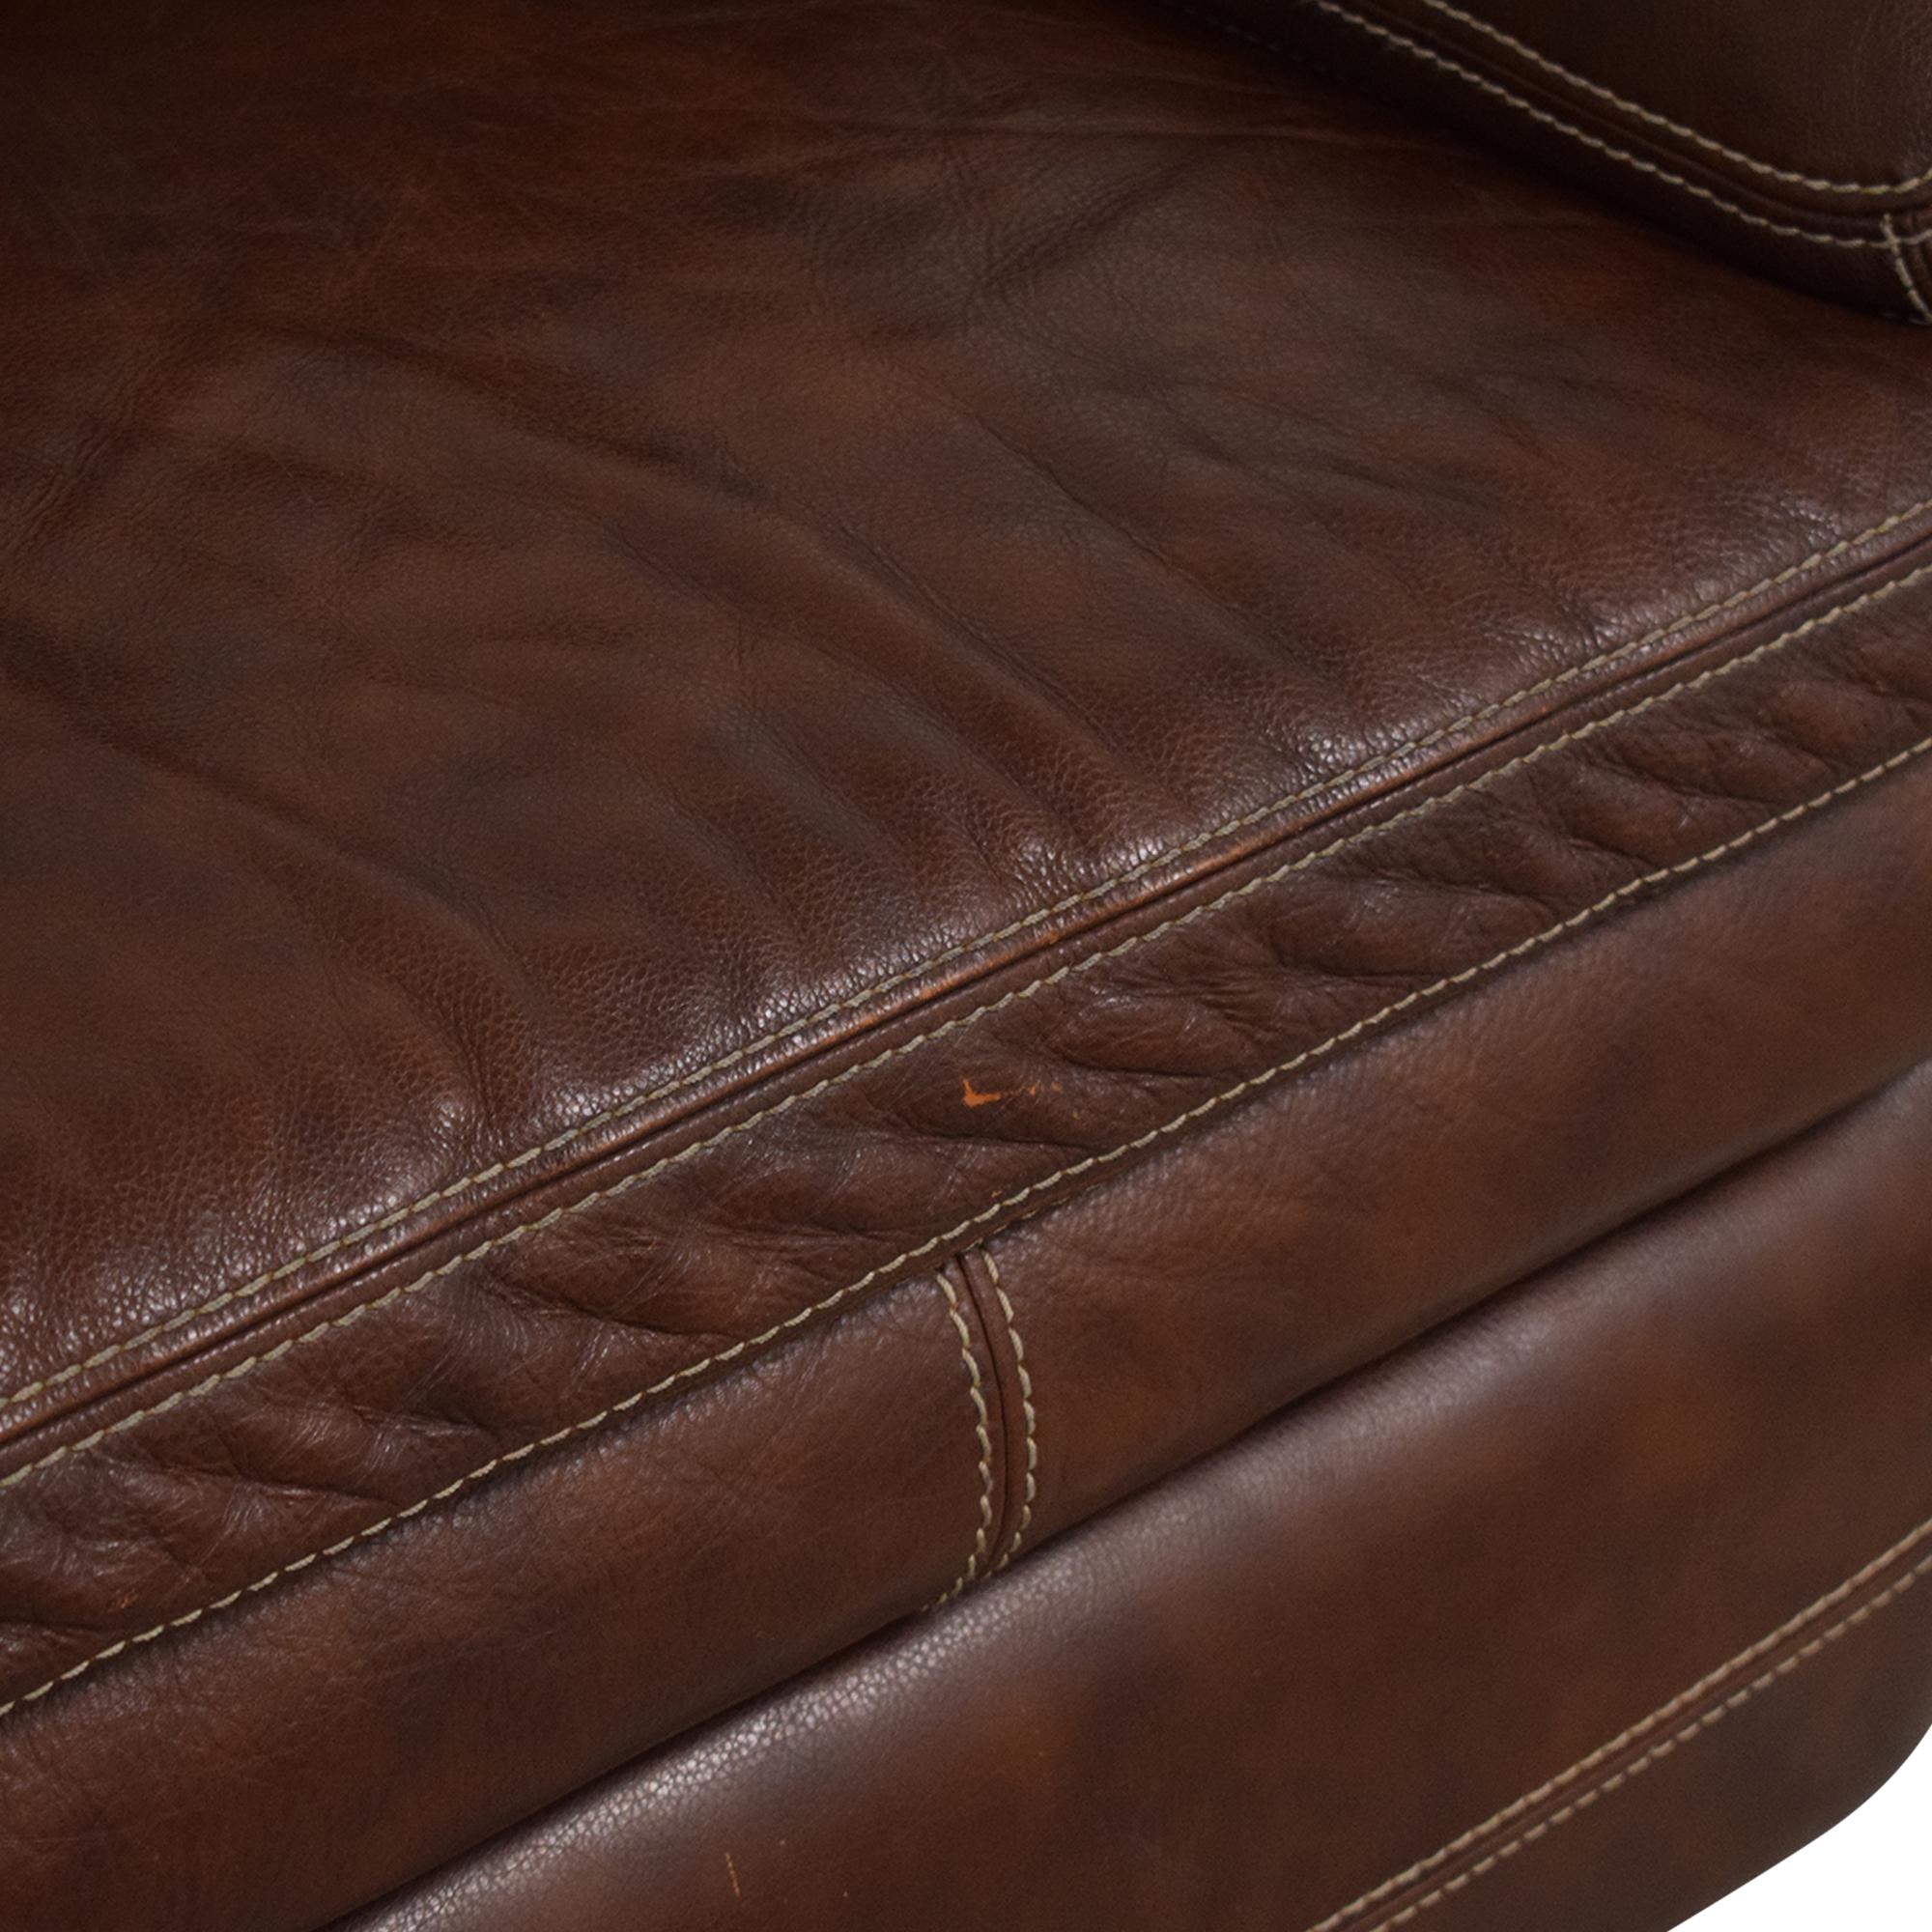 La-Z-Boy Leather Recliner Chair sale